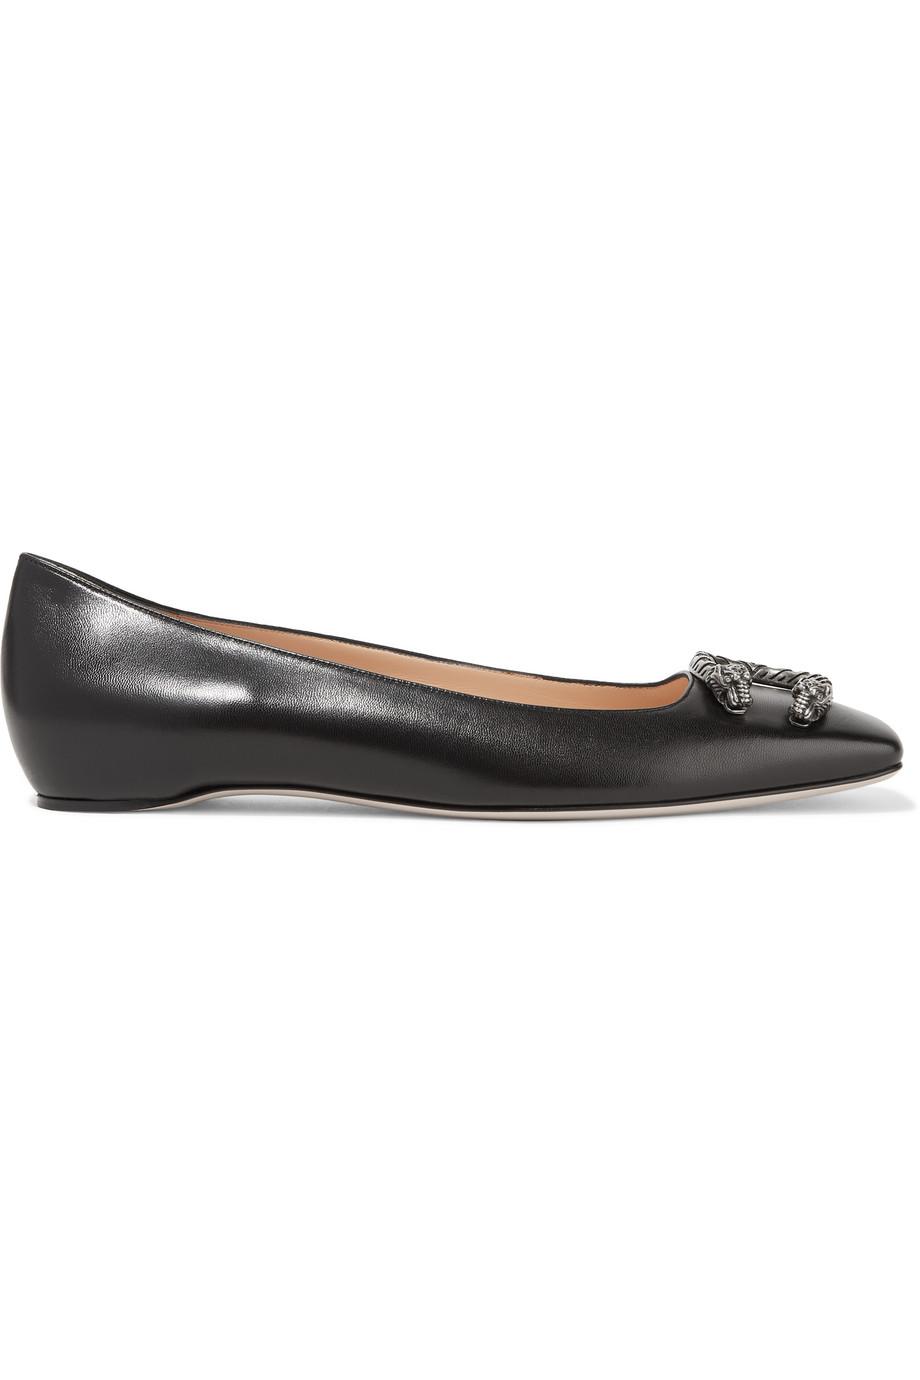 Gucci Dionysus Leather Ballet Flats, Black, Women's US Size: 5.5, Size: 36